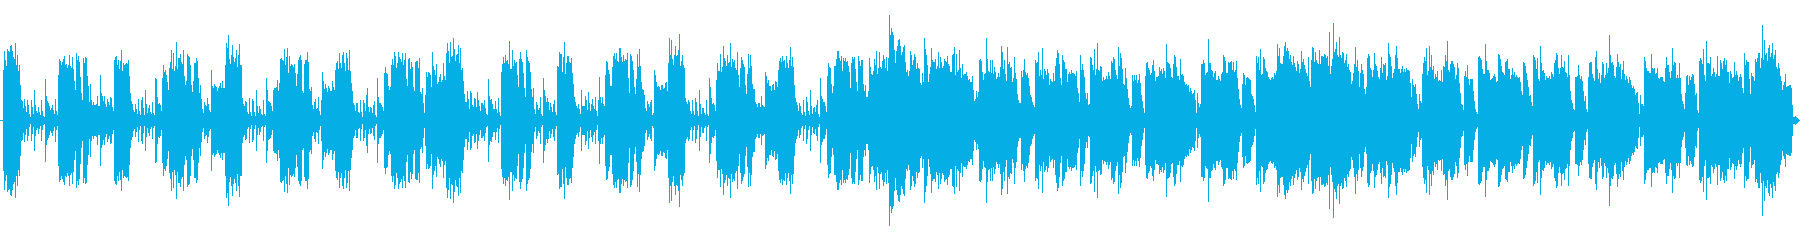 eSportsサイバーロックバンド60秒の再生済みの波形